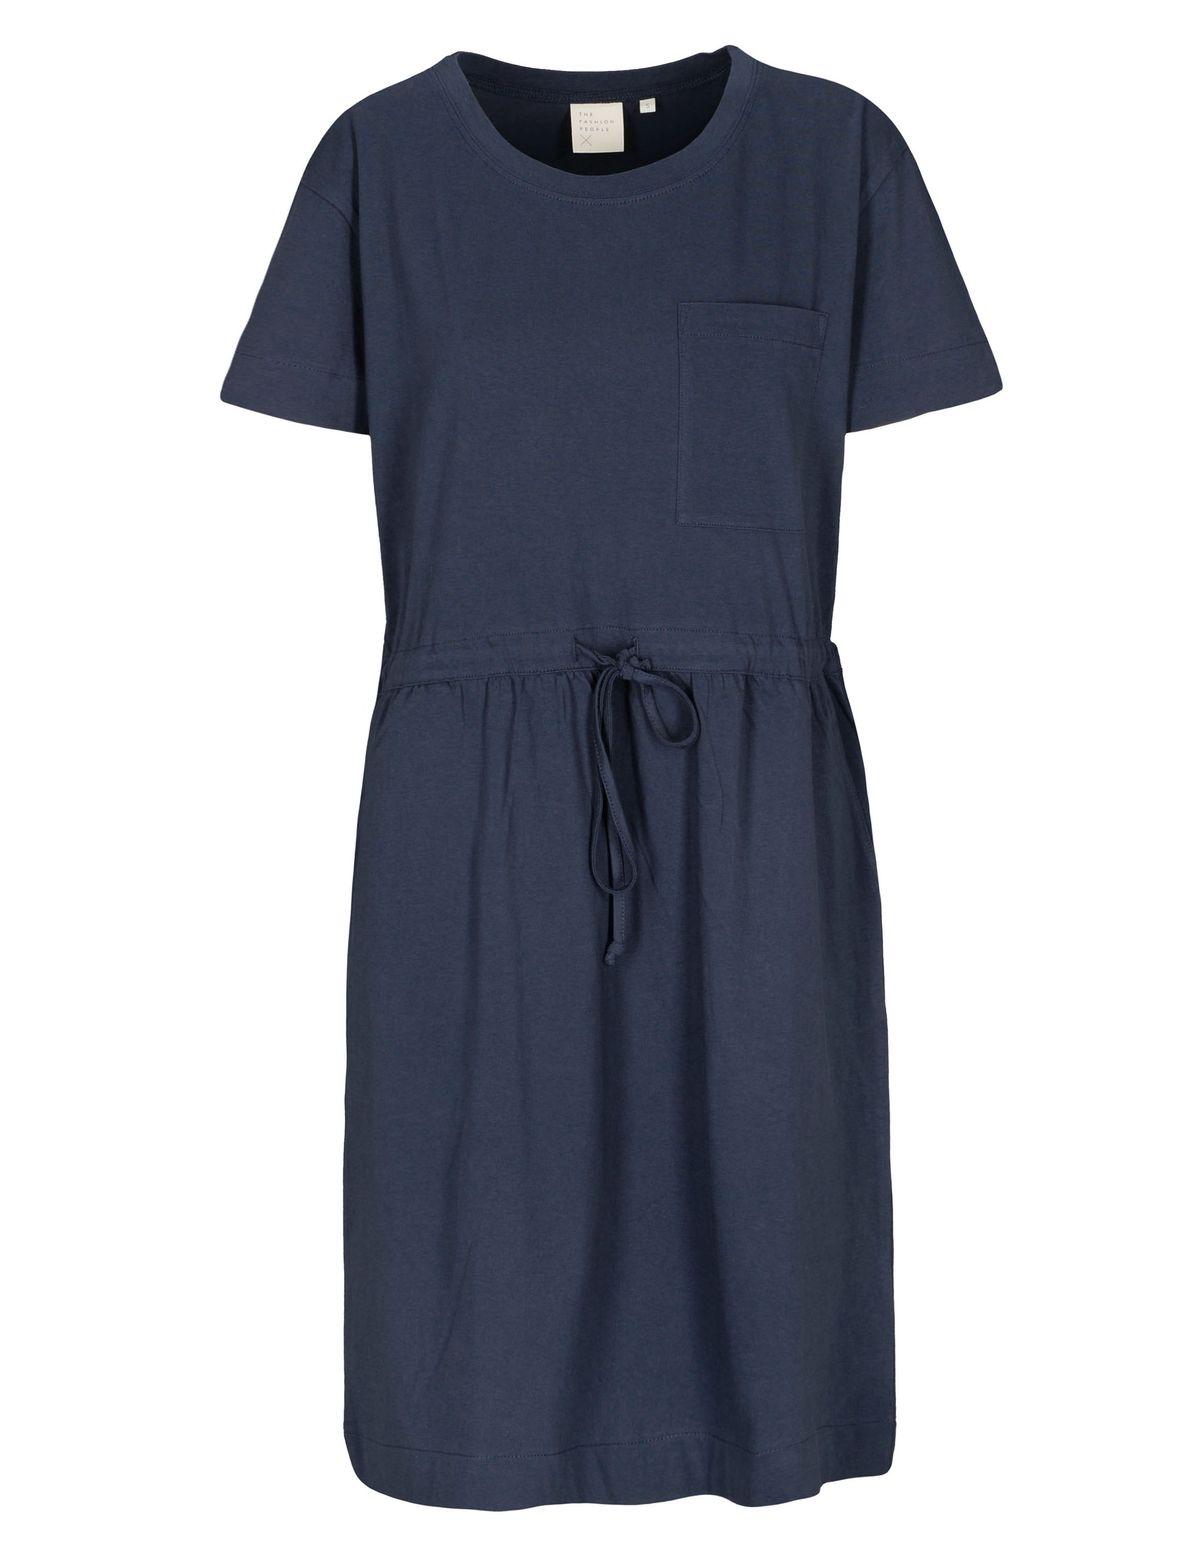 T-Shirt Kleid Organic Cotton - Blue Navy